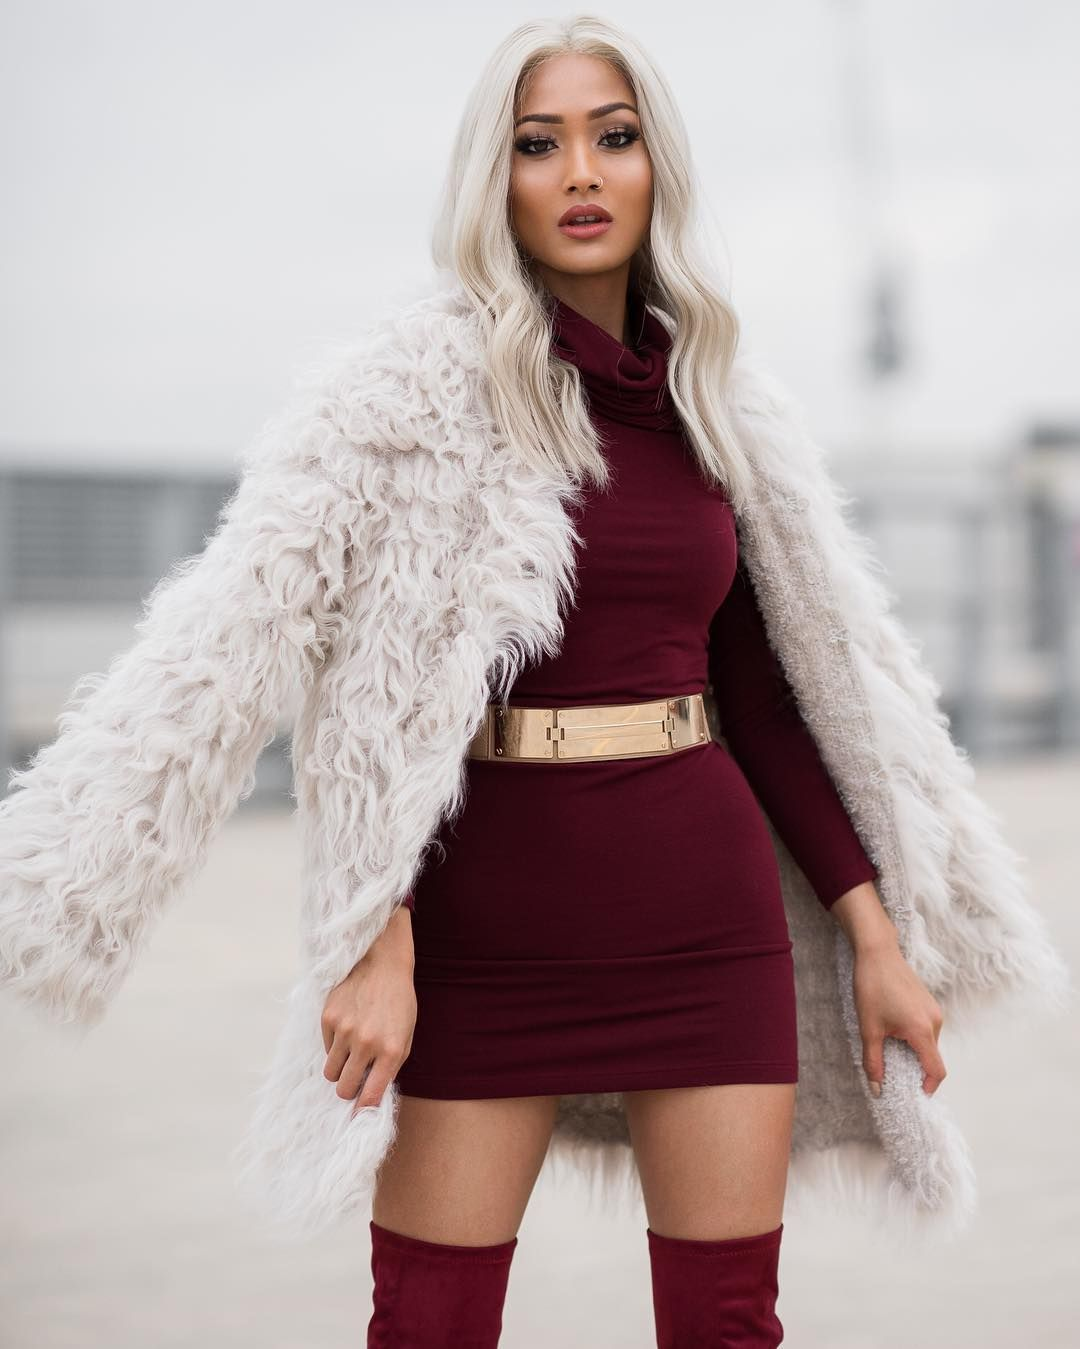 775edfac1f660 Micah Gianneli in faux fur coat and Burgundy dress   My style ...